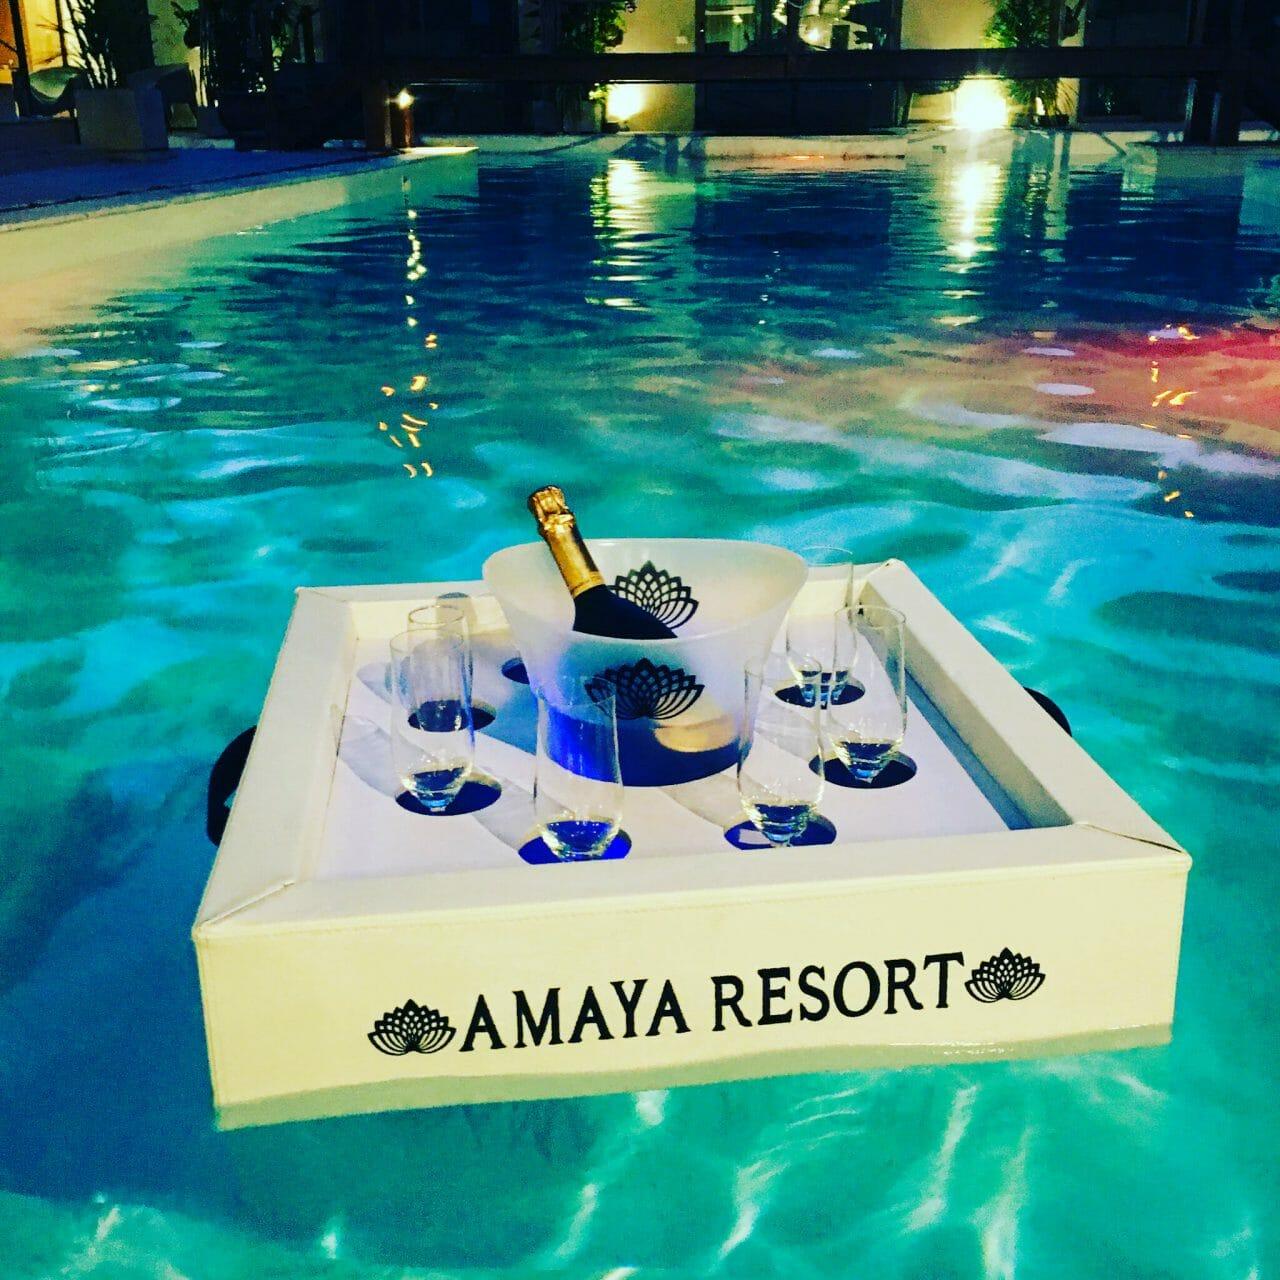 Bar flottant Amaya resort